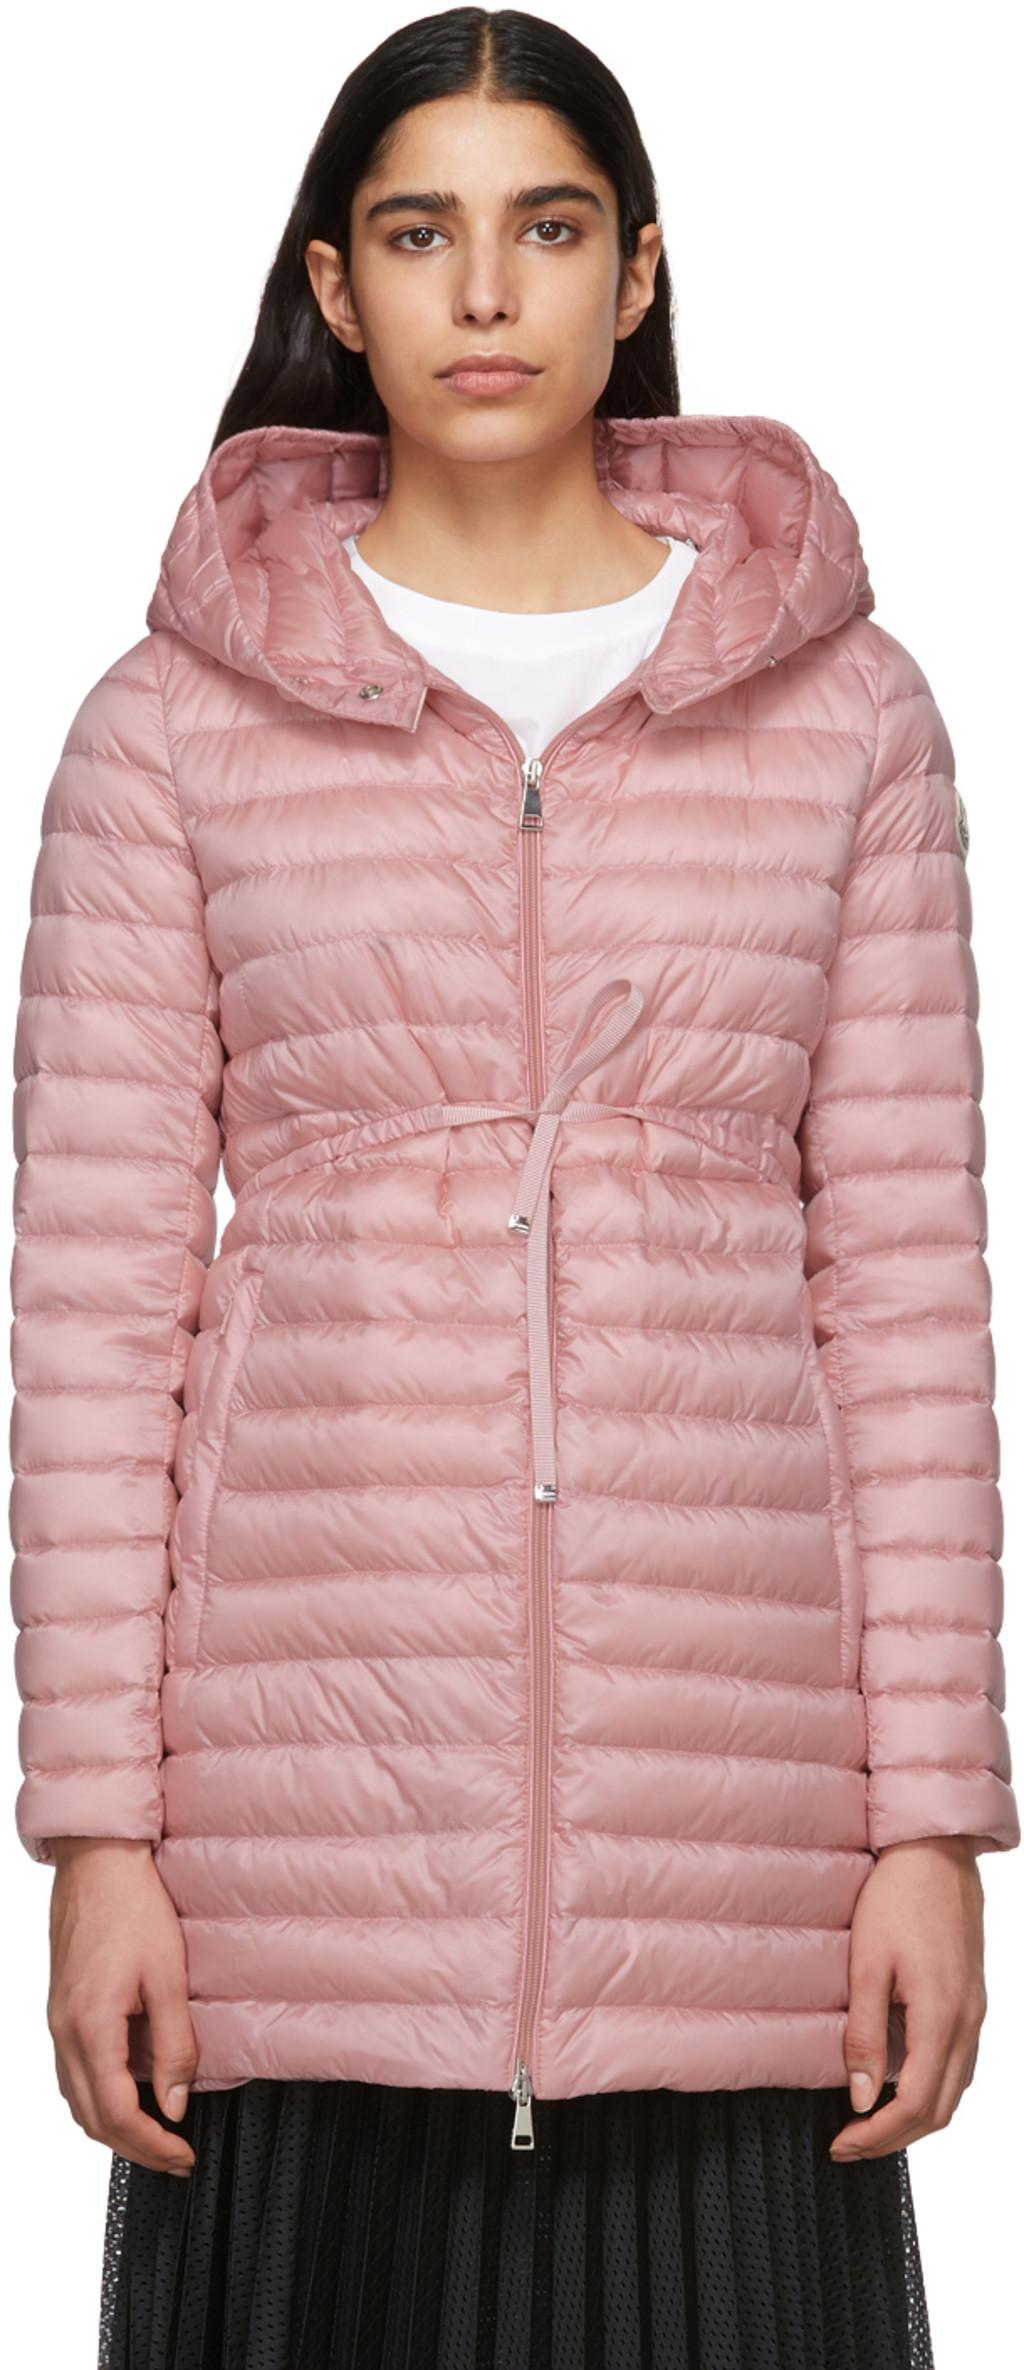 6a4d63818 Pink Down Barbel Jacket